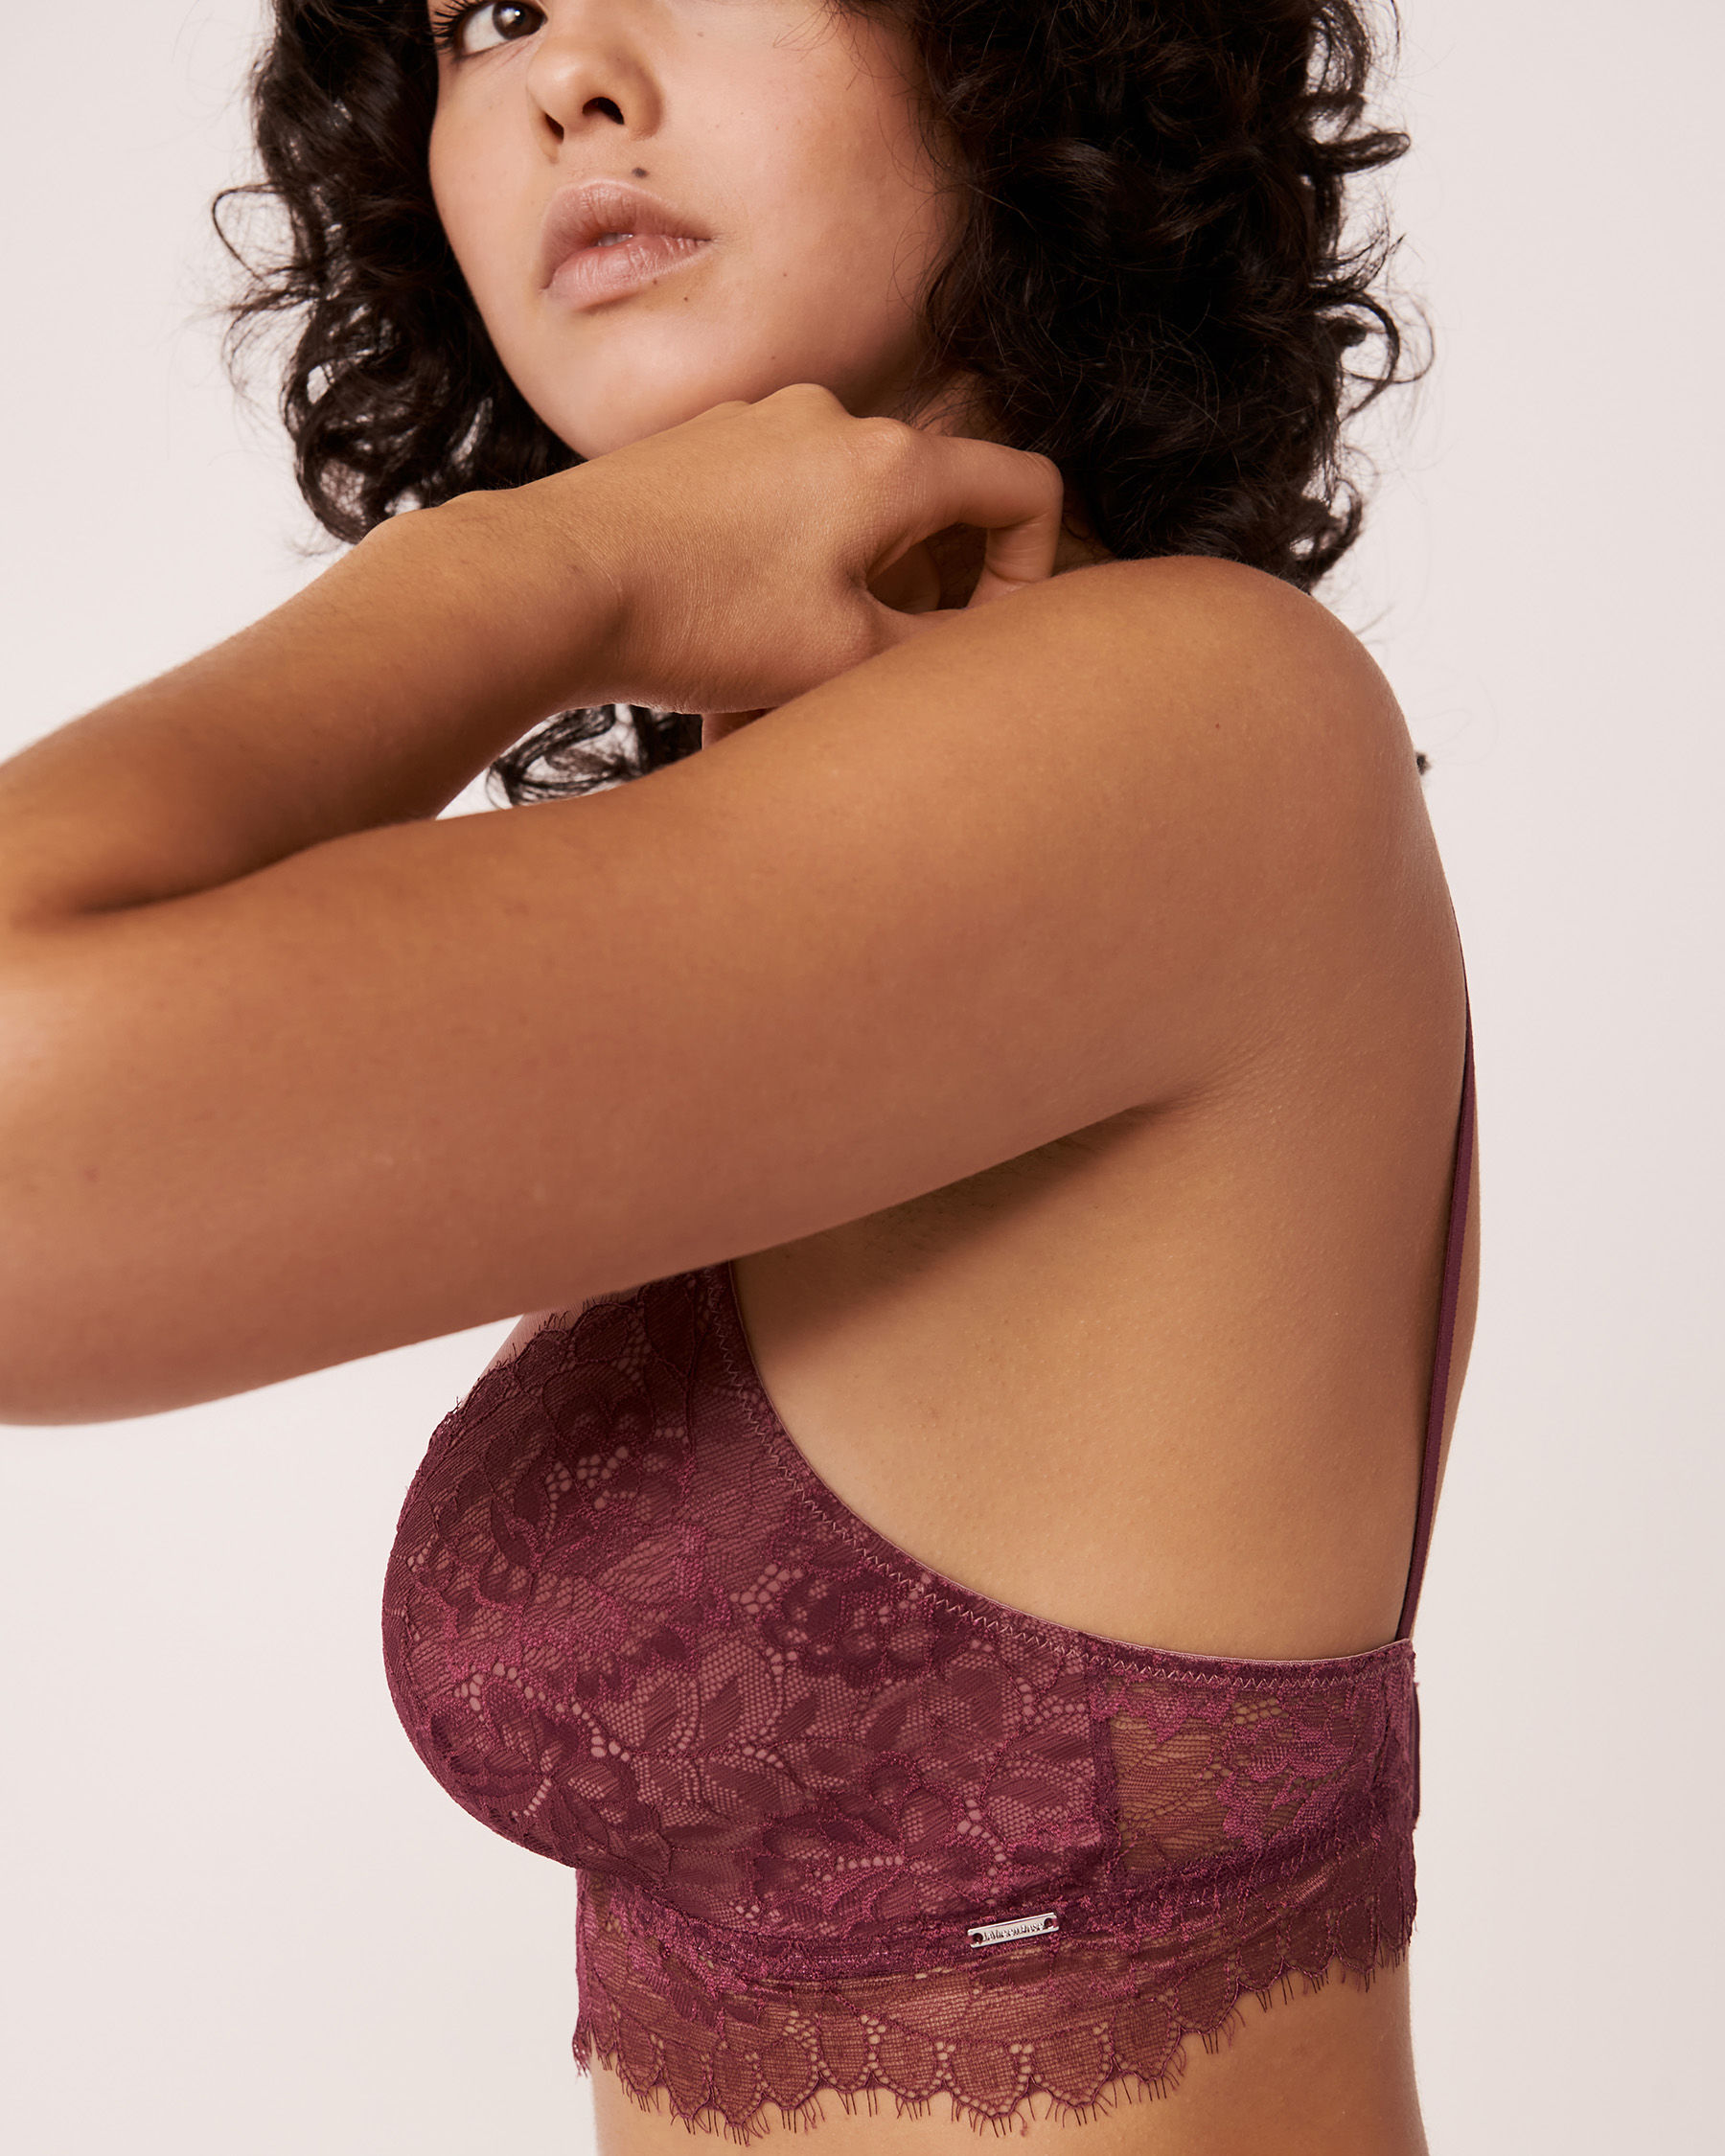 LA VIE EN ROSE Lace and Mesh Bralette Prune 10100030 - View3